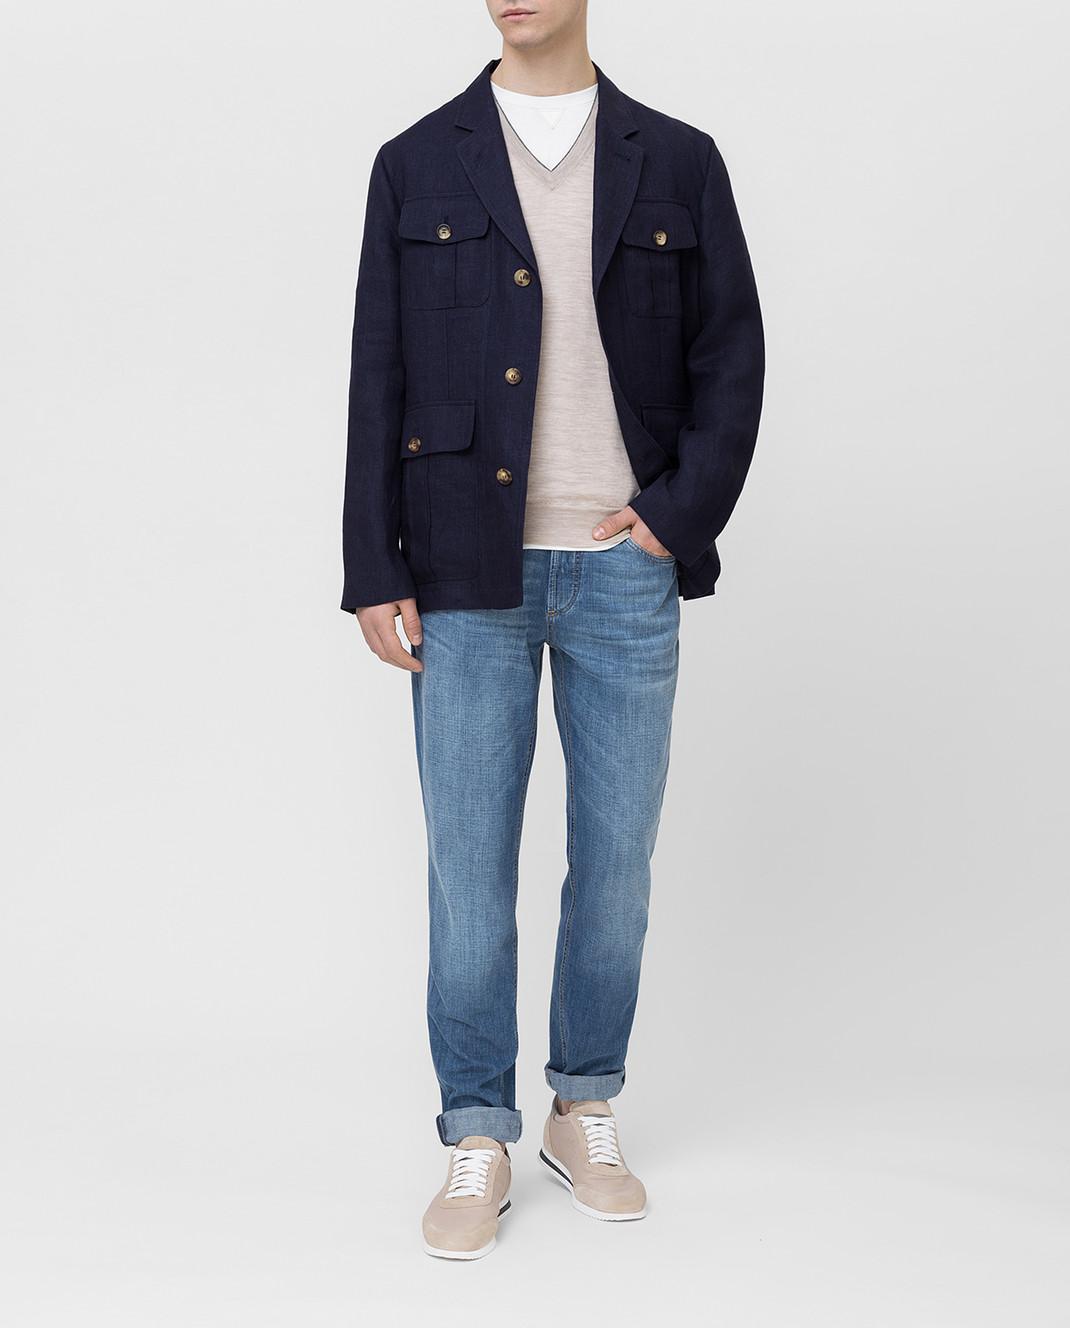 Brunello Cucinelli Синяя куртка MD4176848 изображение 2